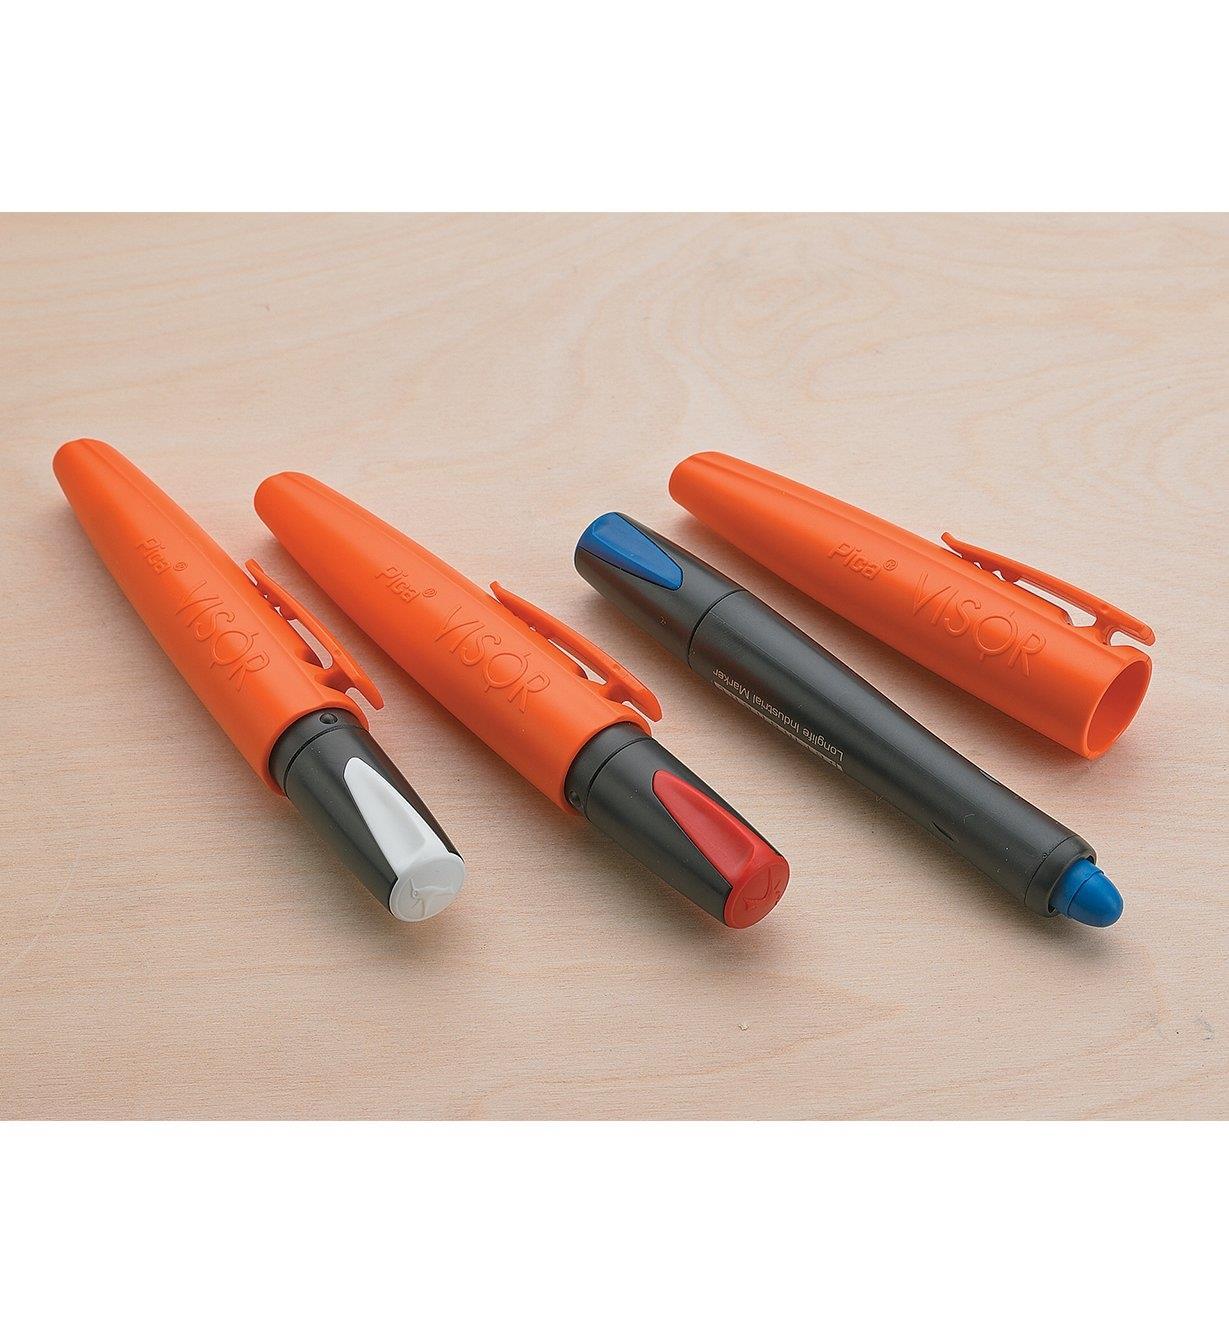 25K0460 - Pica-Visor White Marking Crayon